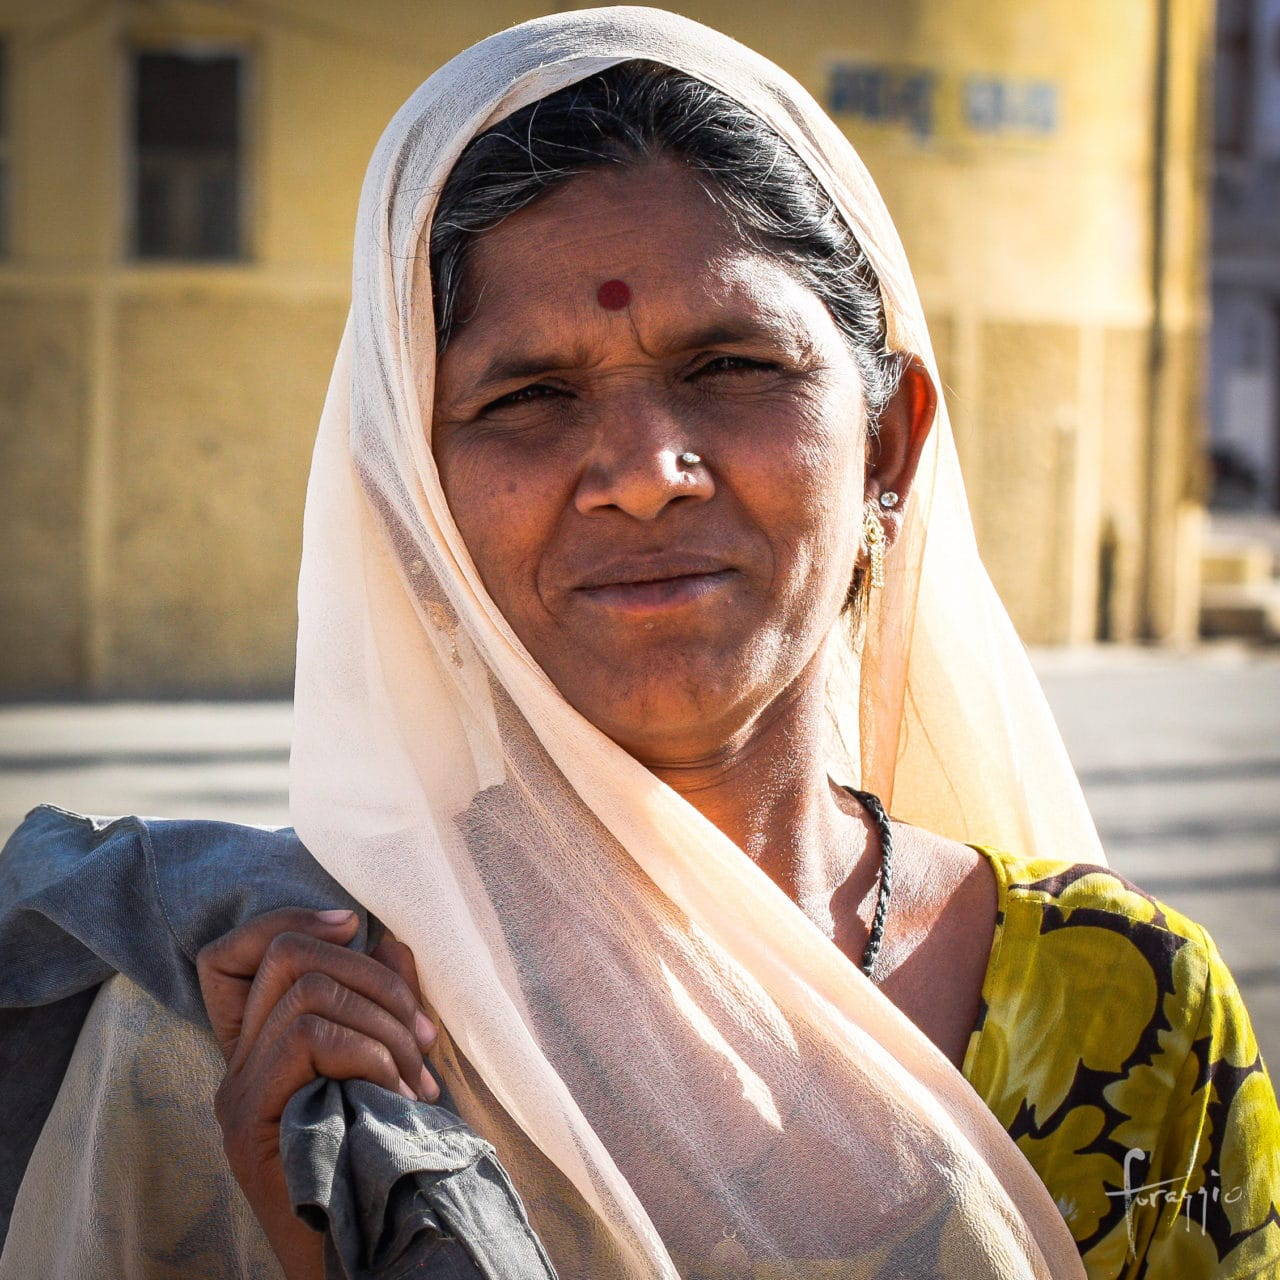 Udaipur woman | Foraggio Photographic